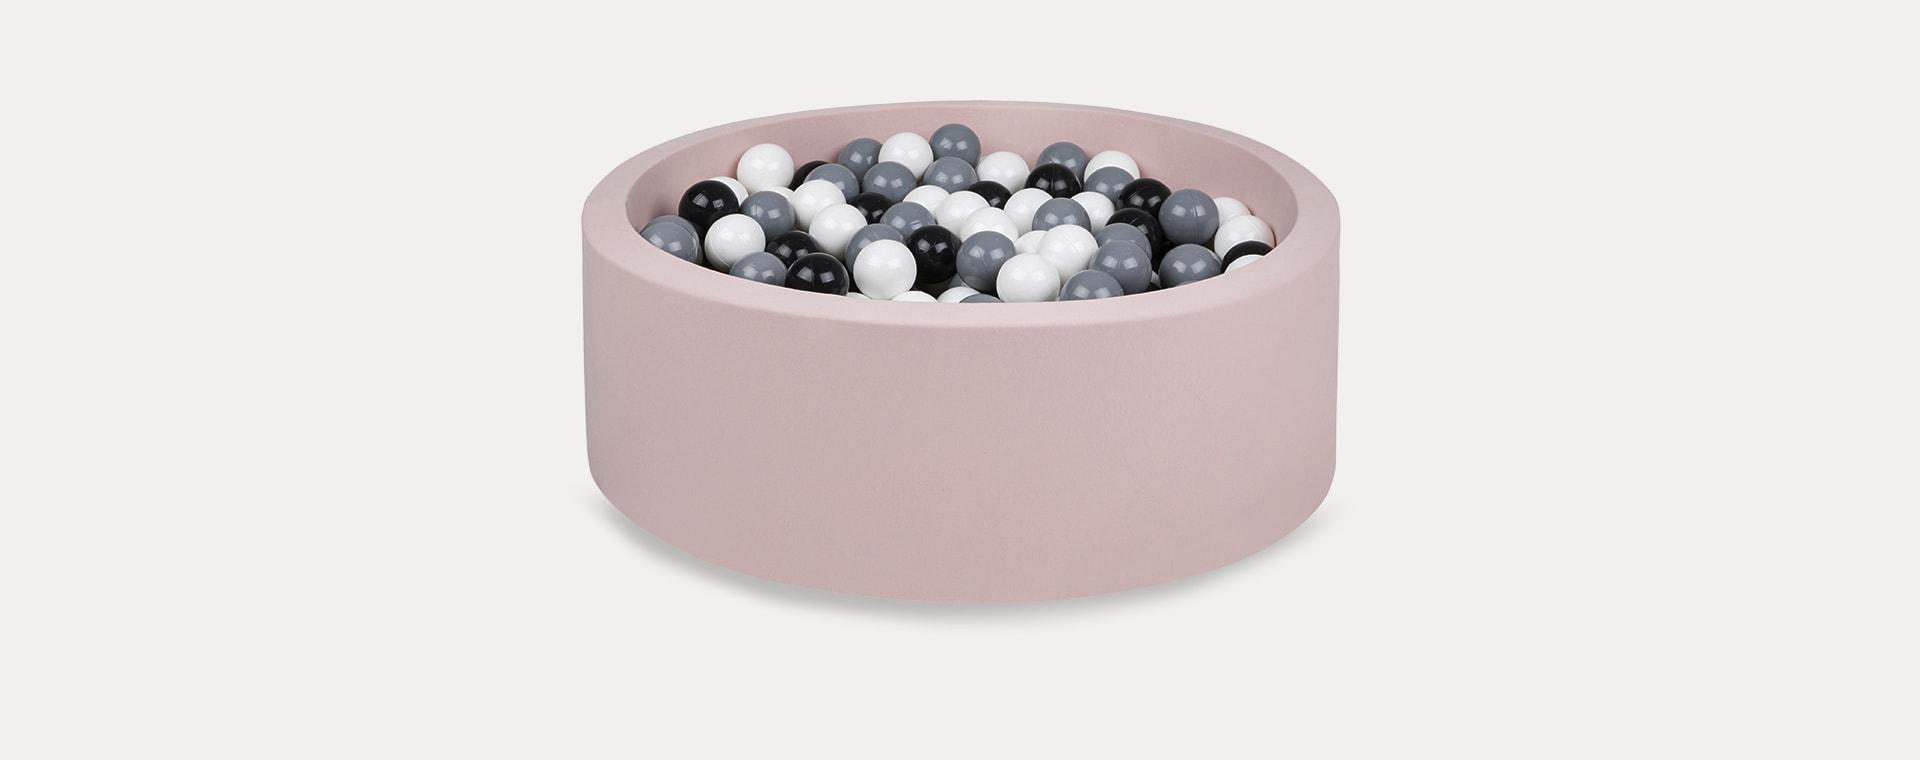 Black/Grey/White Balls Larisa and Pumpkin Ball Pit